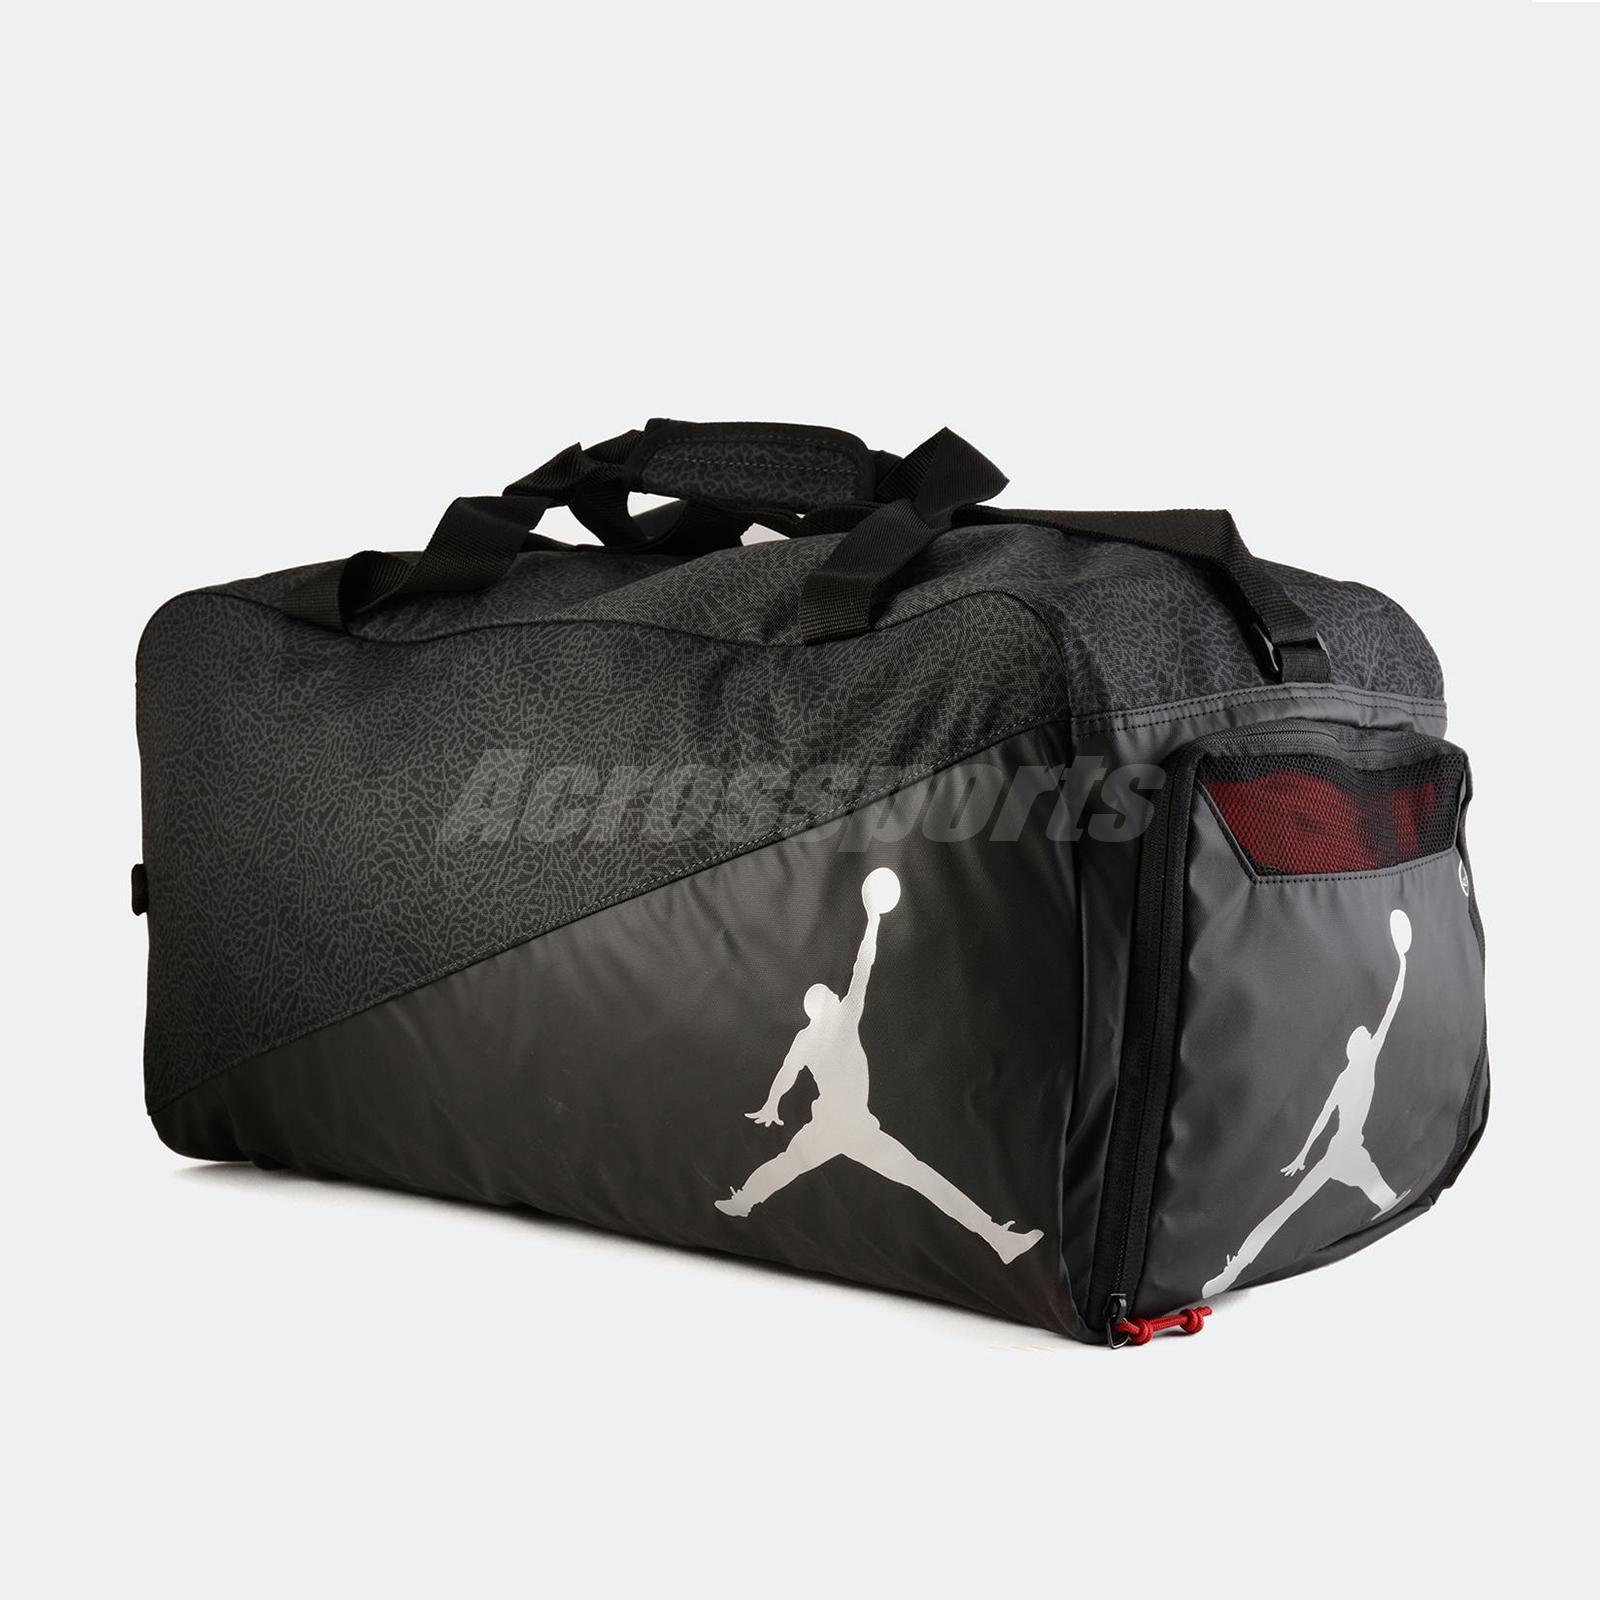 Nike jordan elemental duffle bag large elephant print jumpman black silver  gym jpg 1600x1600 Jordan duffel b5b92de702